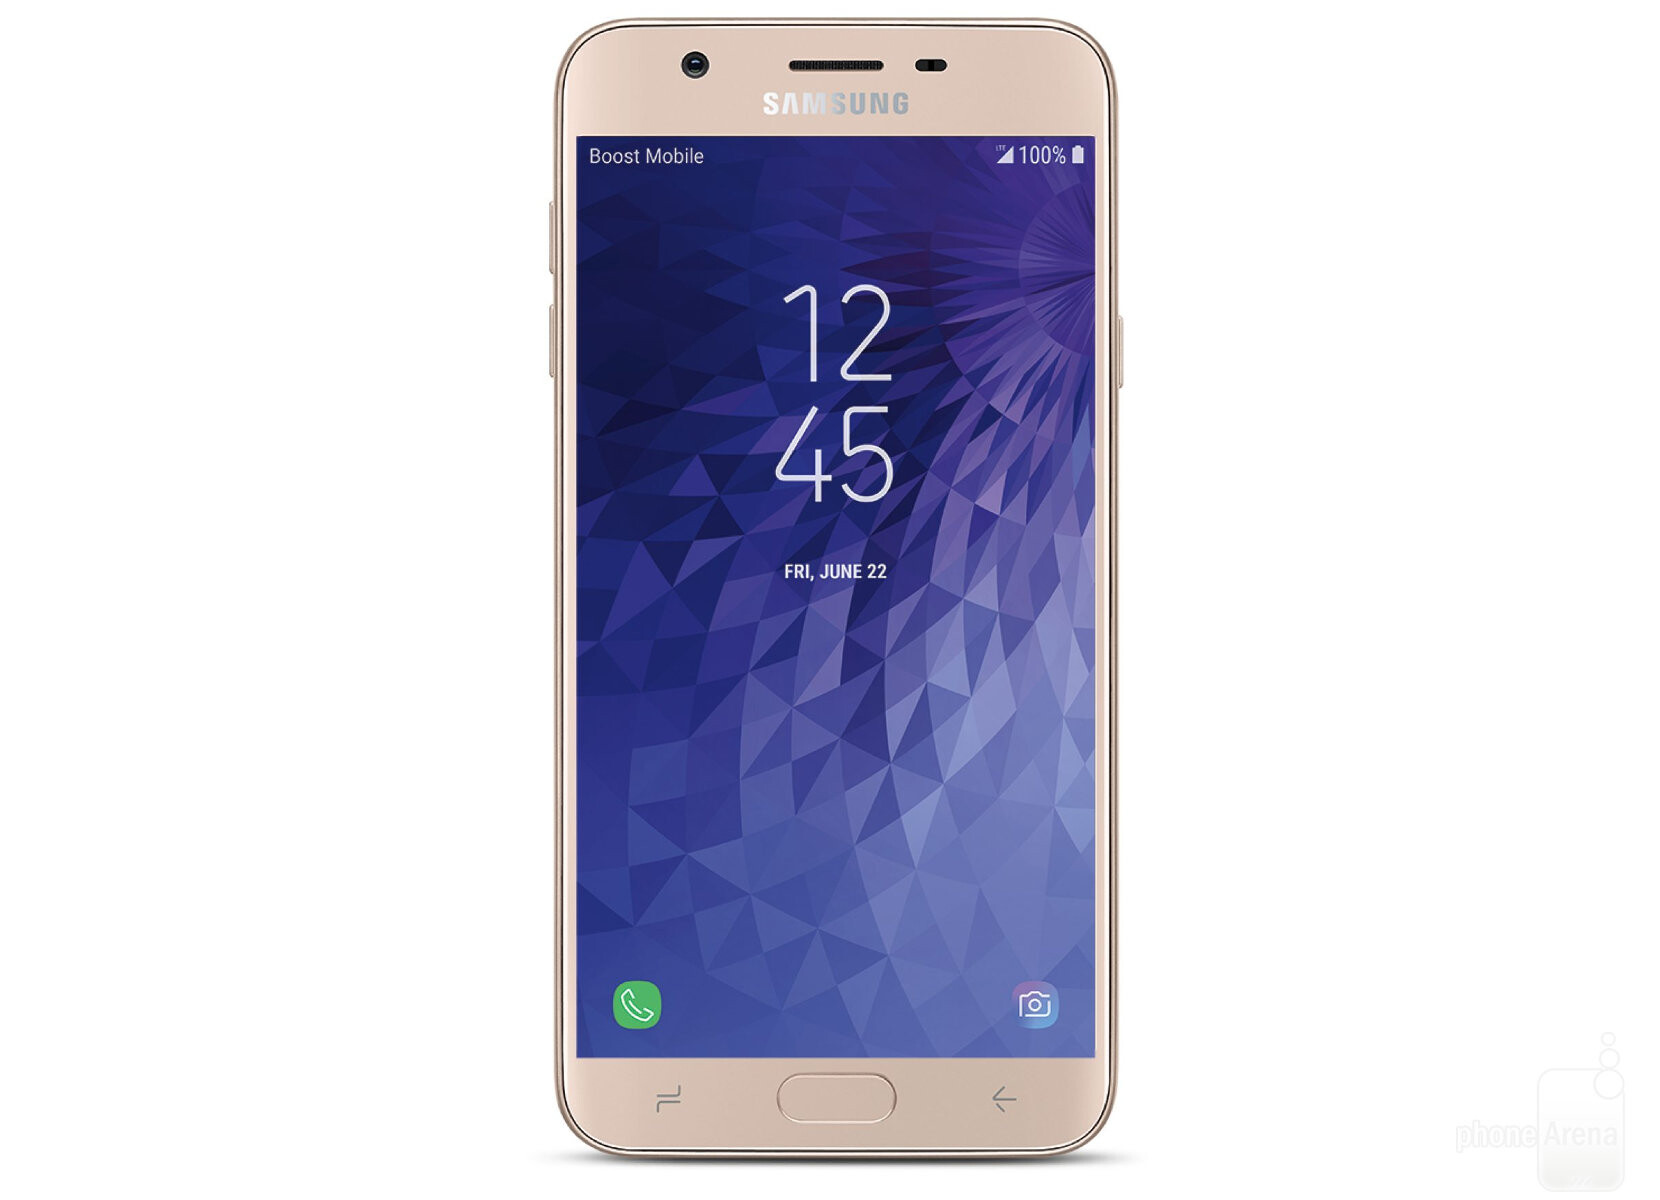 samsung j7 refine samsung galaxy j7 refine j3 achieve released by sprint and boost mobile phonearena